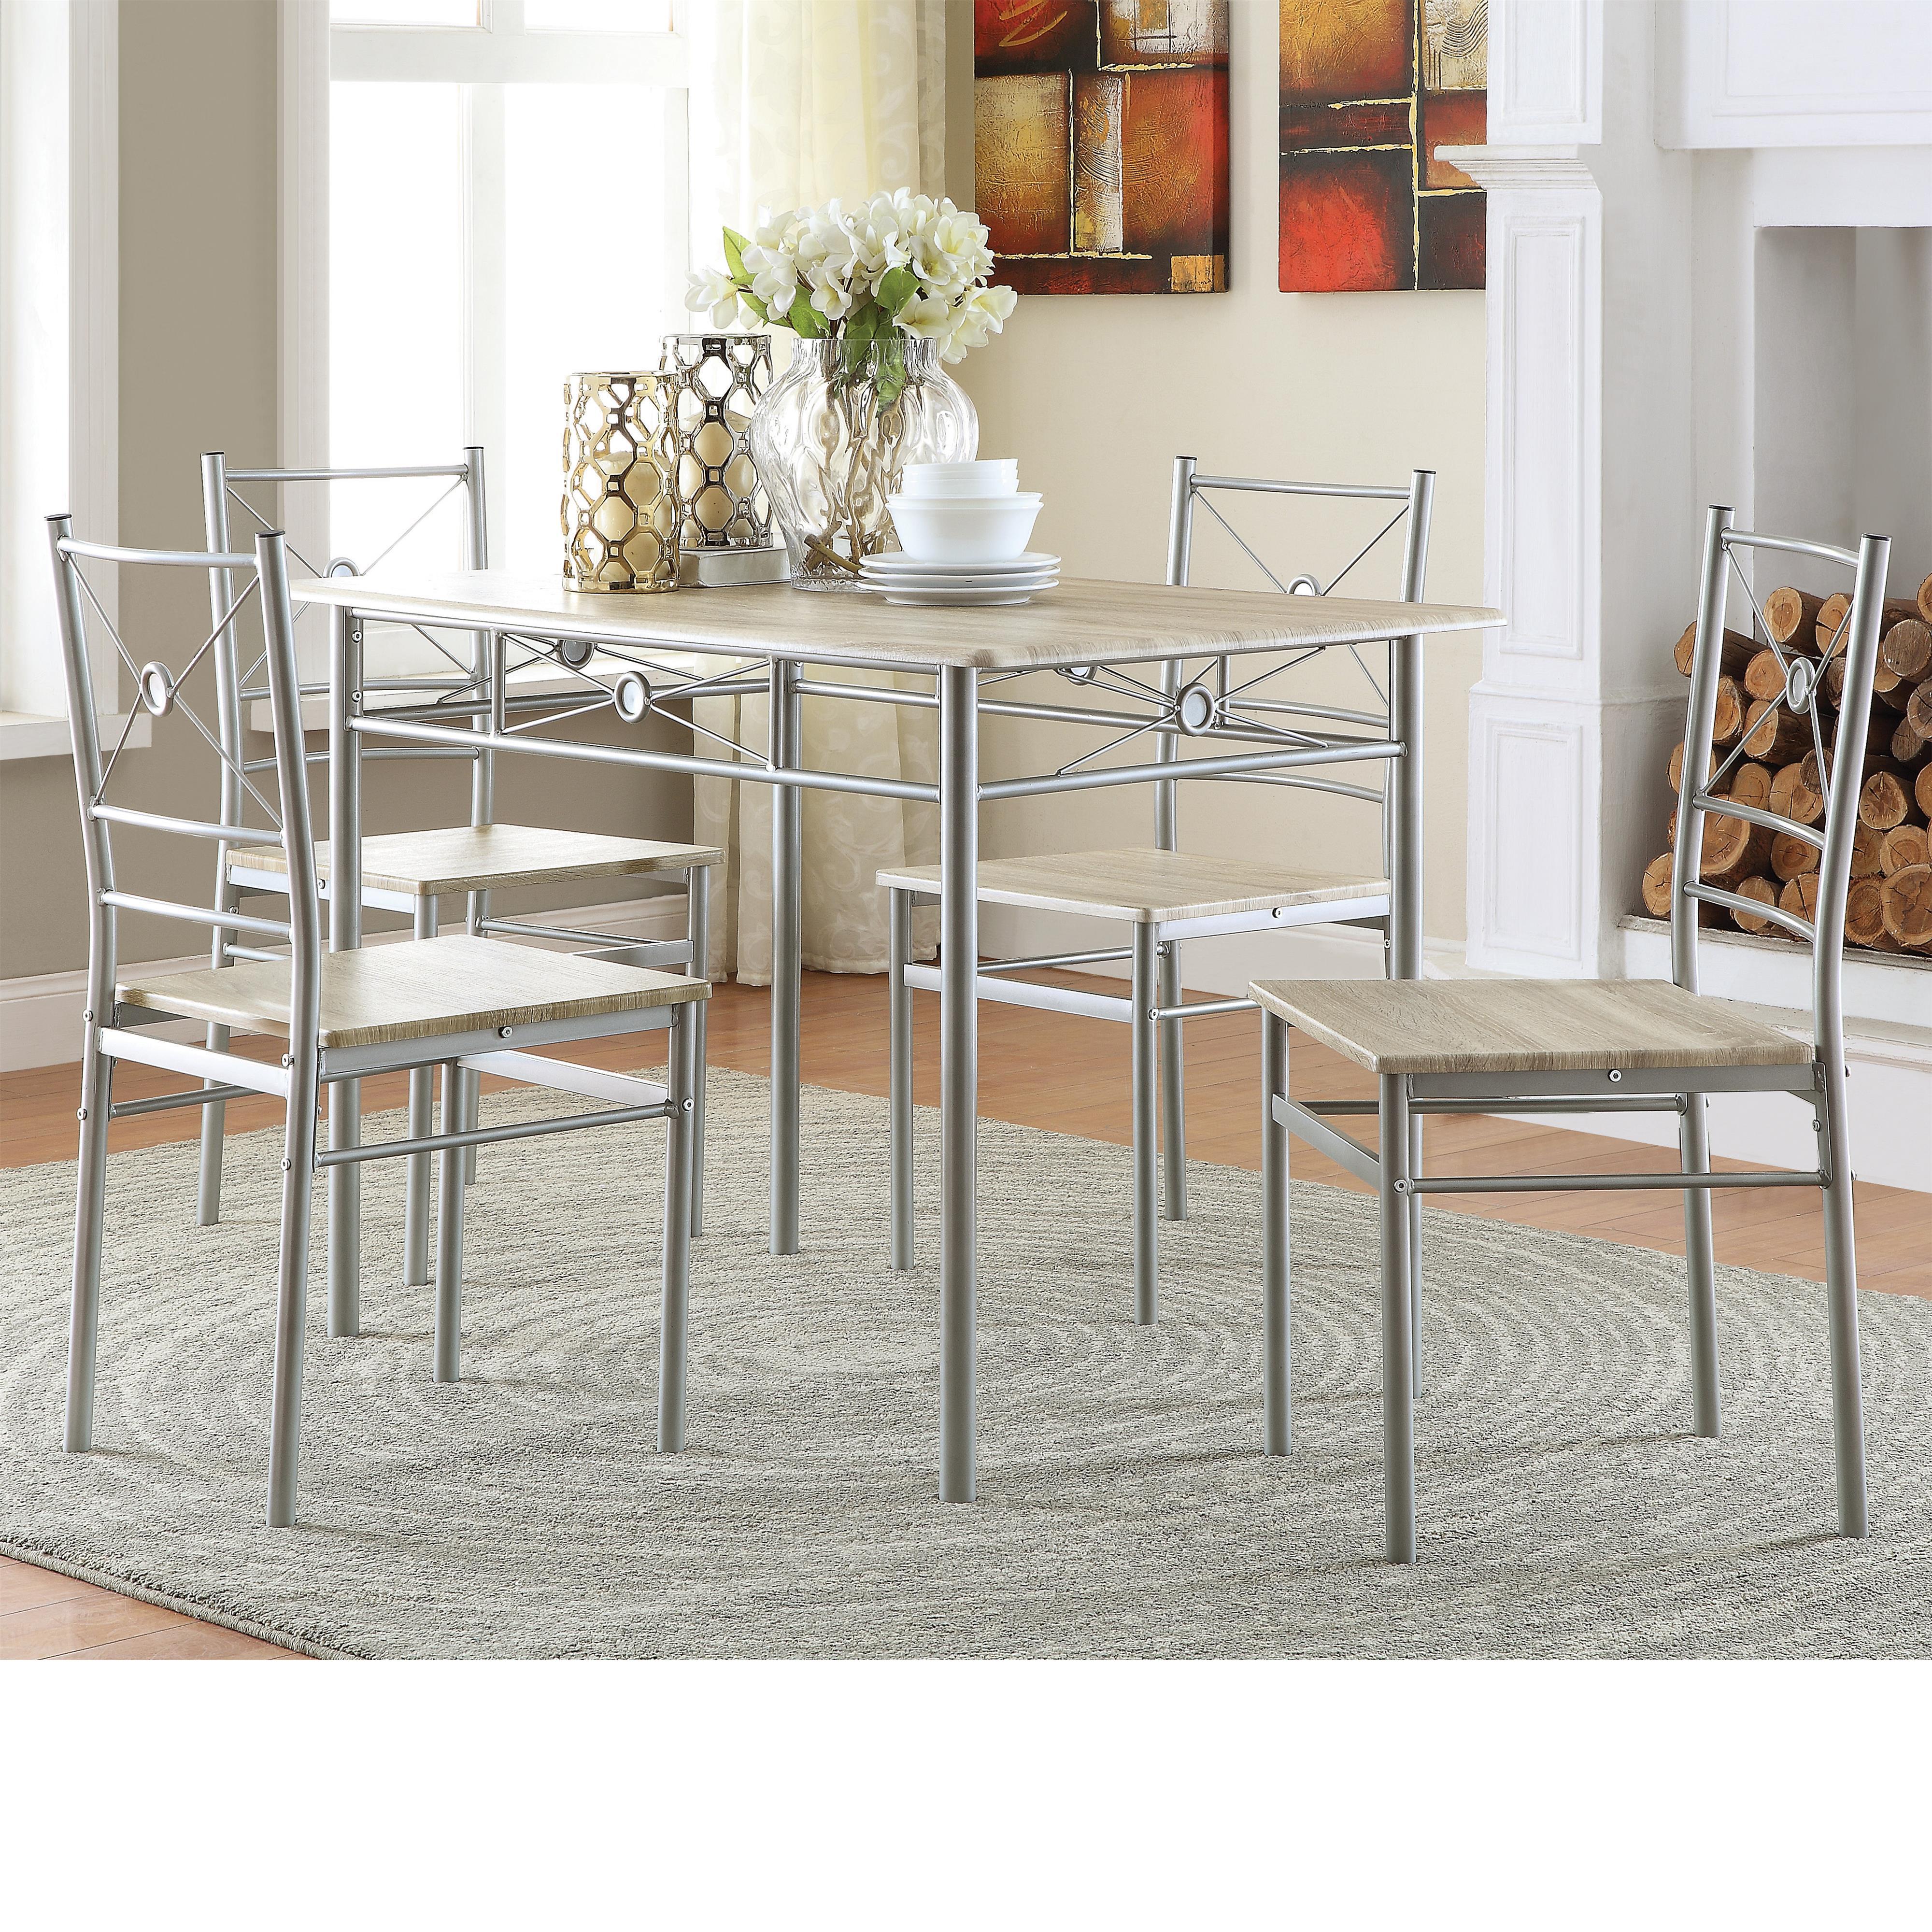 5Pcs Dining Table Set - Shop for Affordable Home Furniture, Decor ...